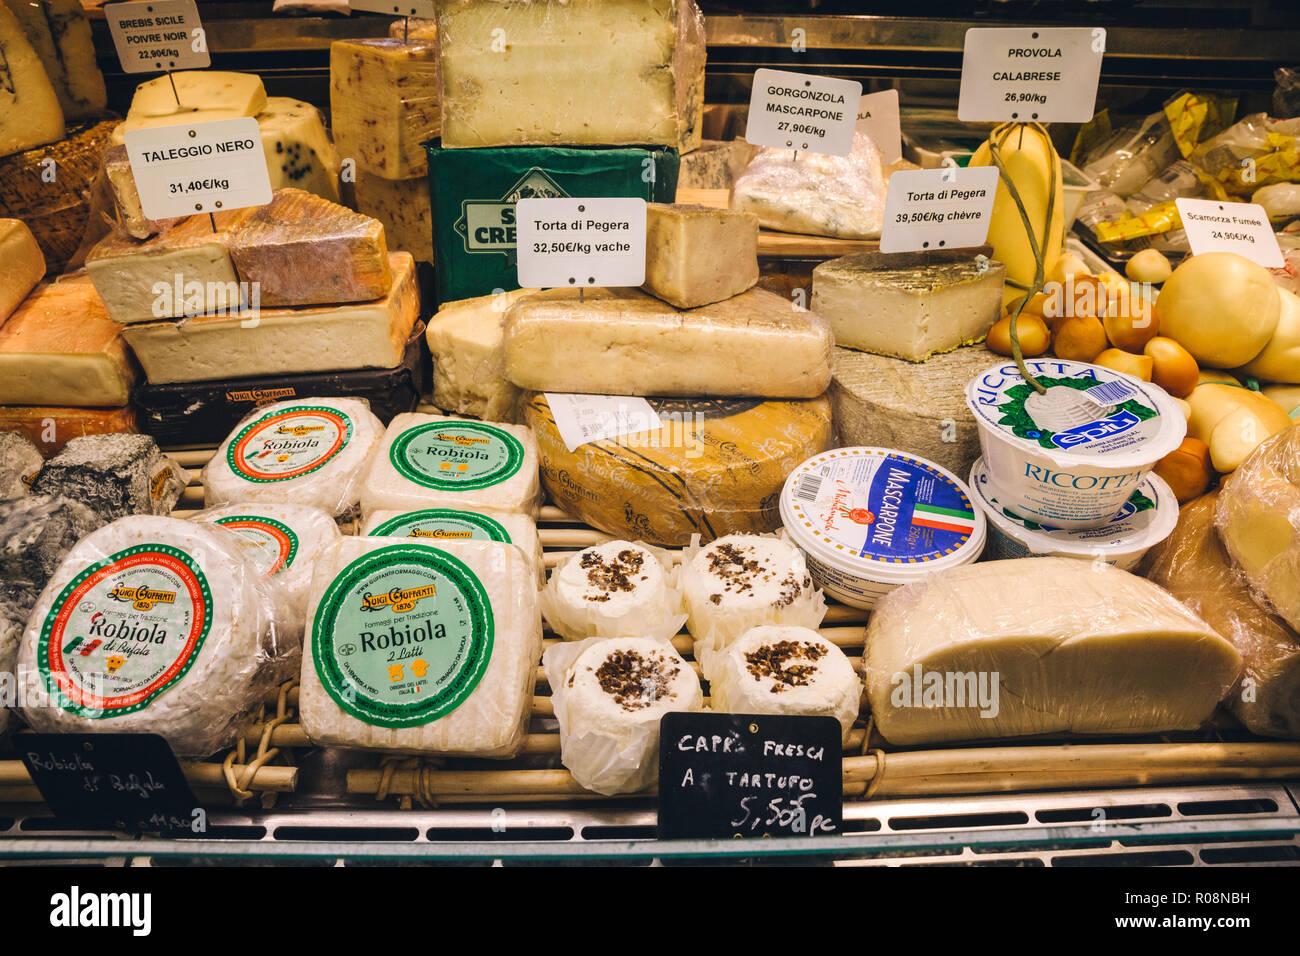 Cheese, Marché des Capucins, French Market, Bordeaux, France 2017 - Stock Image